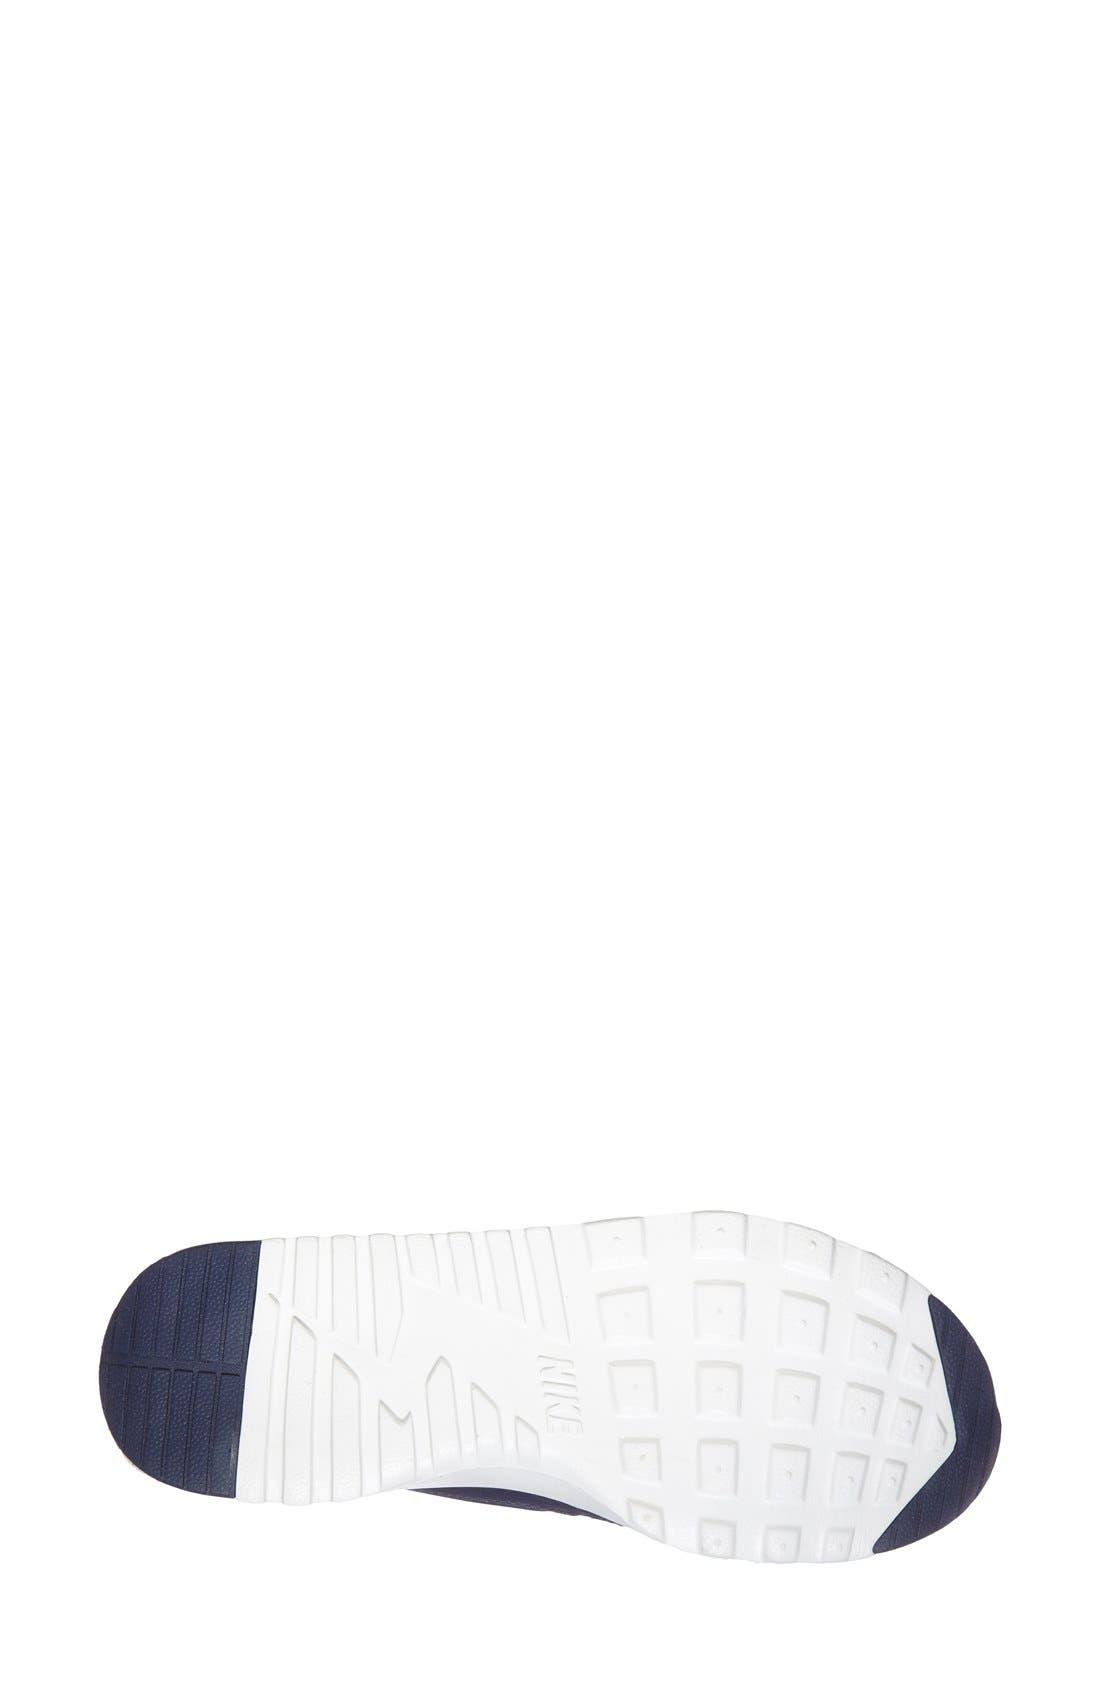 Alternate Image 4  - Nike 'Air Max Thea Joli' Sneaker (Women)